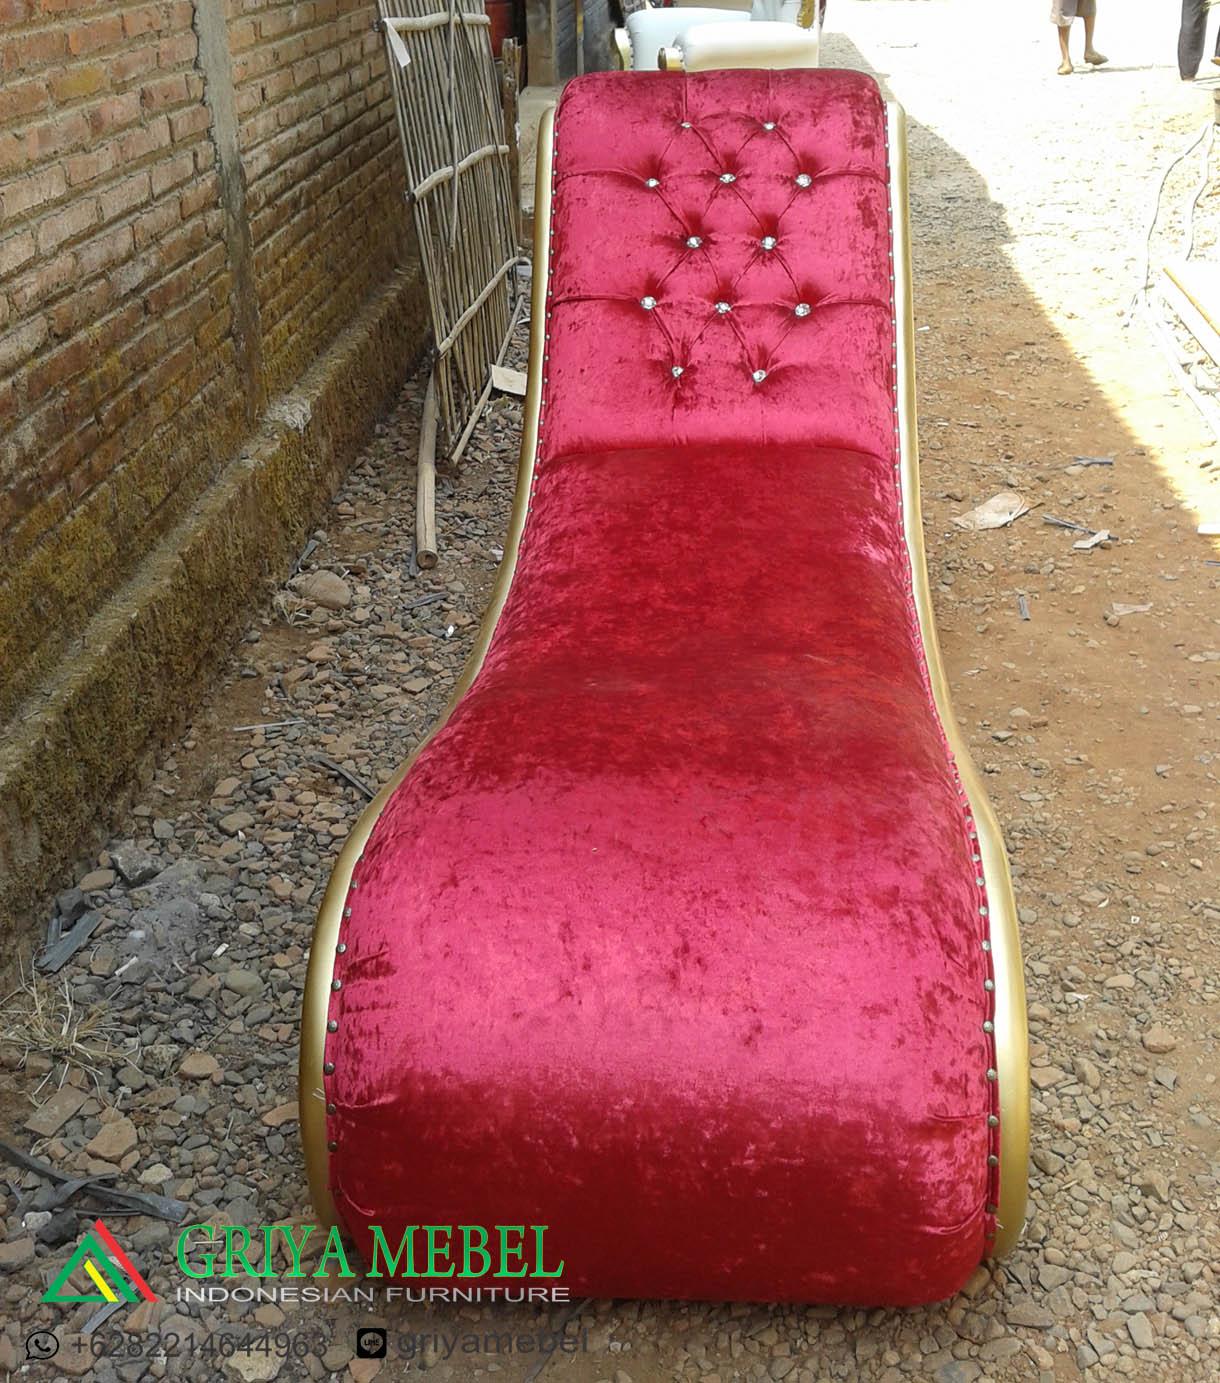 Sofa Keong Murah, ukuran sofa keong, harga sofa keong, sofa lois murah, sofa cleopatra murah, sofa syahrini murah, sofa santai murah, model sofa santai, model sofa santai, desain sofa santai, sofa keluarga, model sofa keluarga, sofa lois duco, ukuran sofa lois angsa, harga sofa lois angsa, gambar sofa lois, sofa mewah, sofa eleghant, sofa terbaru, sofa klasik mewah, sofa murah, bangku sofa, sofa pengantin, sofa teras, furniture jati, sofa jati, sofa minimalis, sofa klasik, sofa antik, sofa duco putih, furniture duco putih, furniture murah